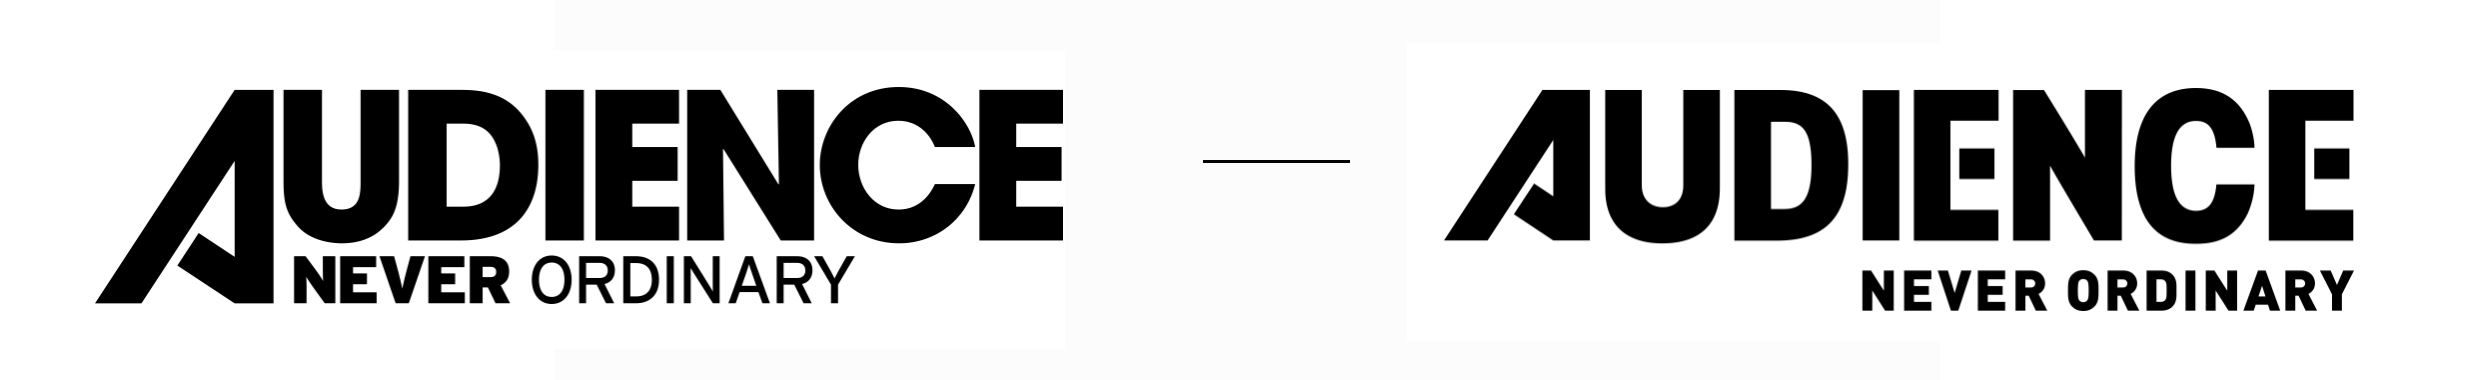 aUDIENCE_logos_a.jpg